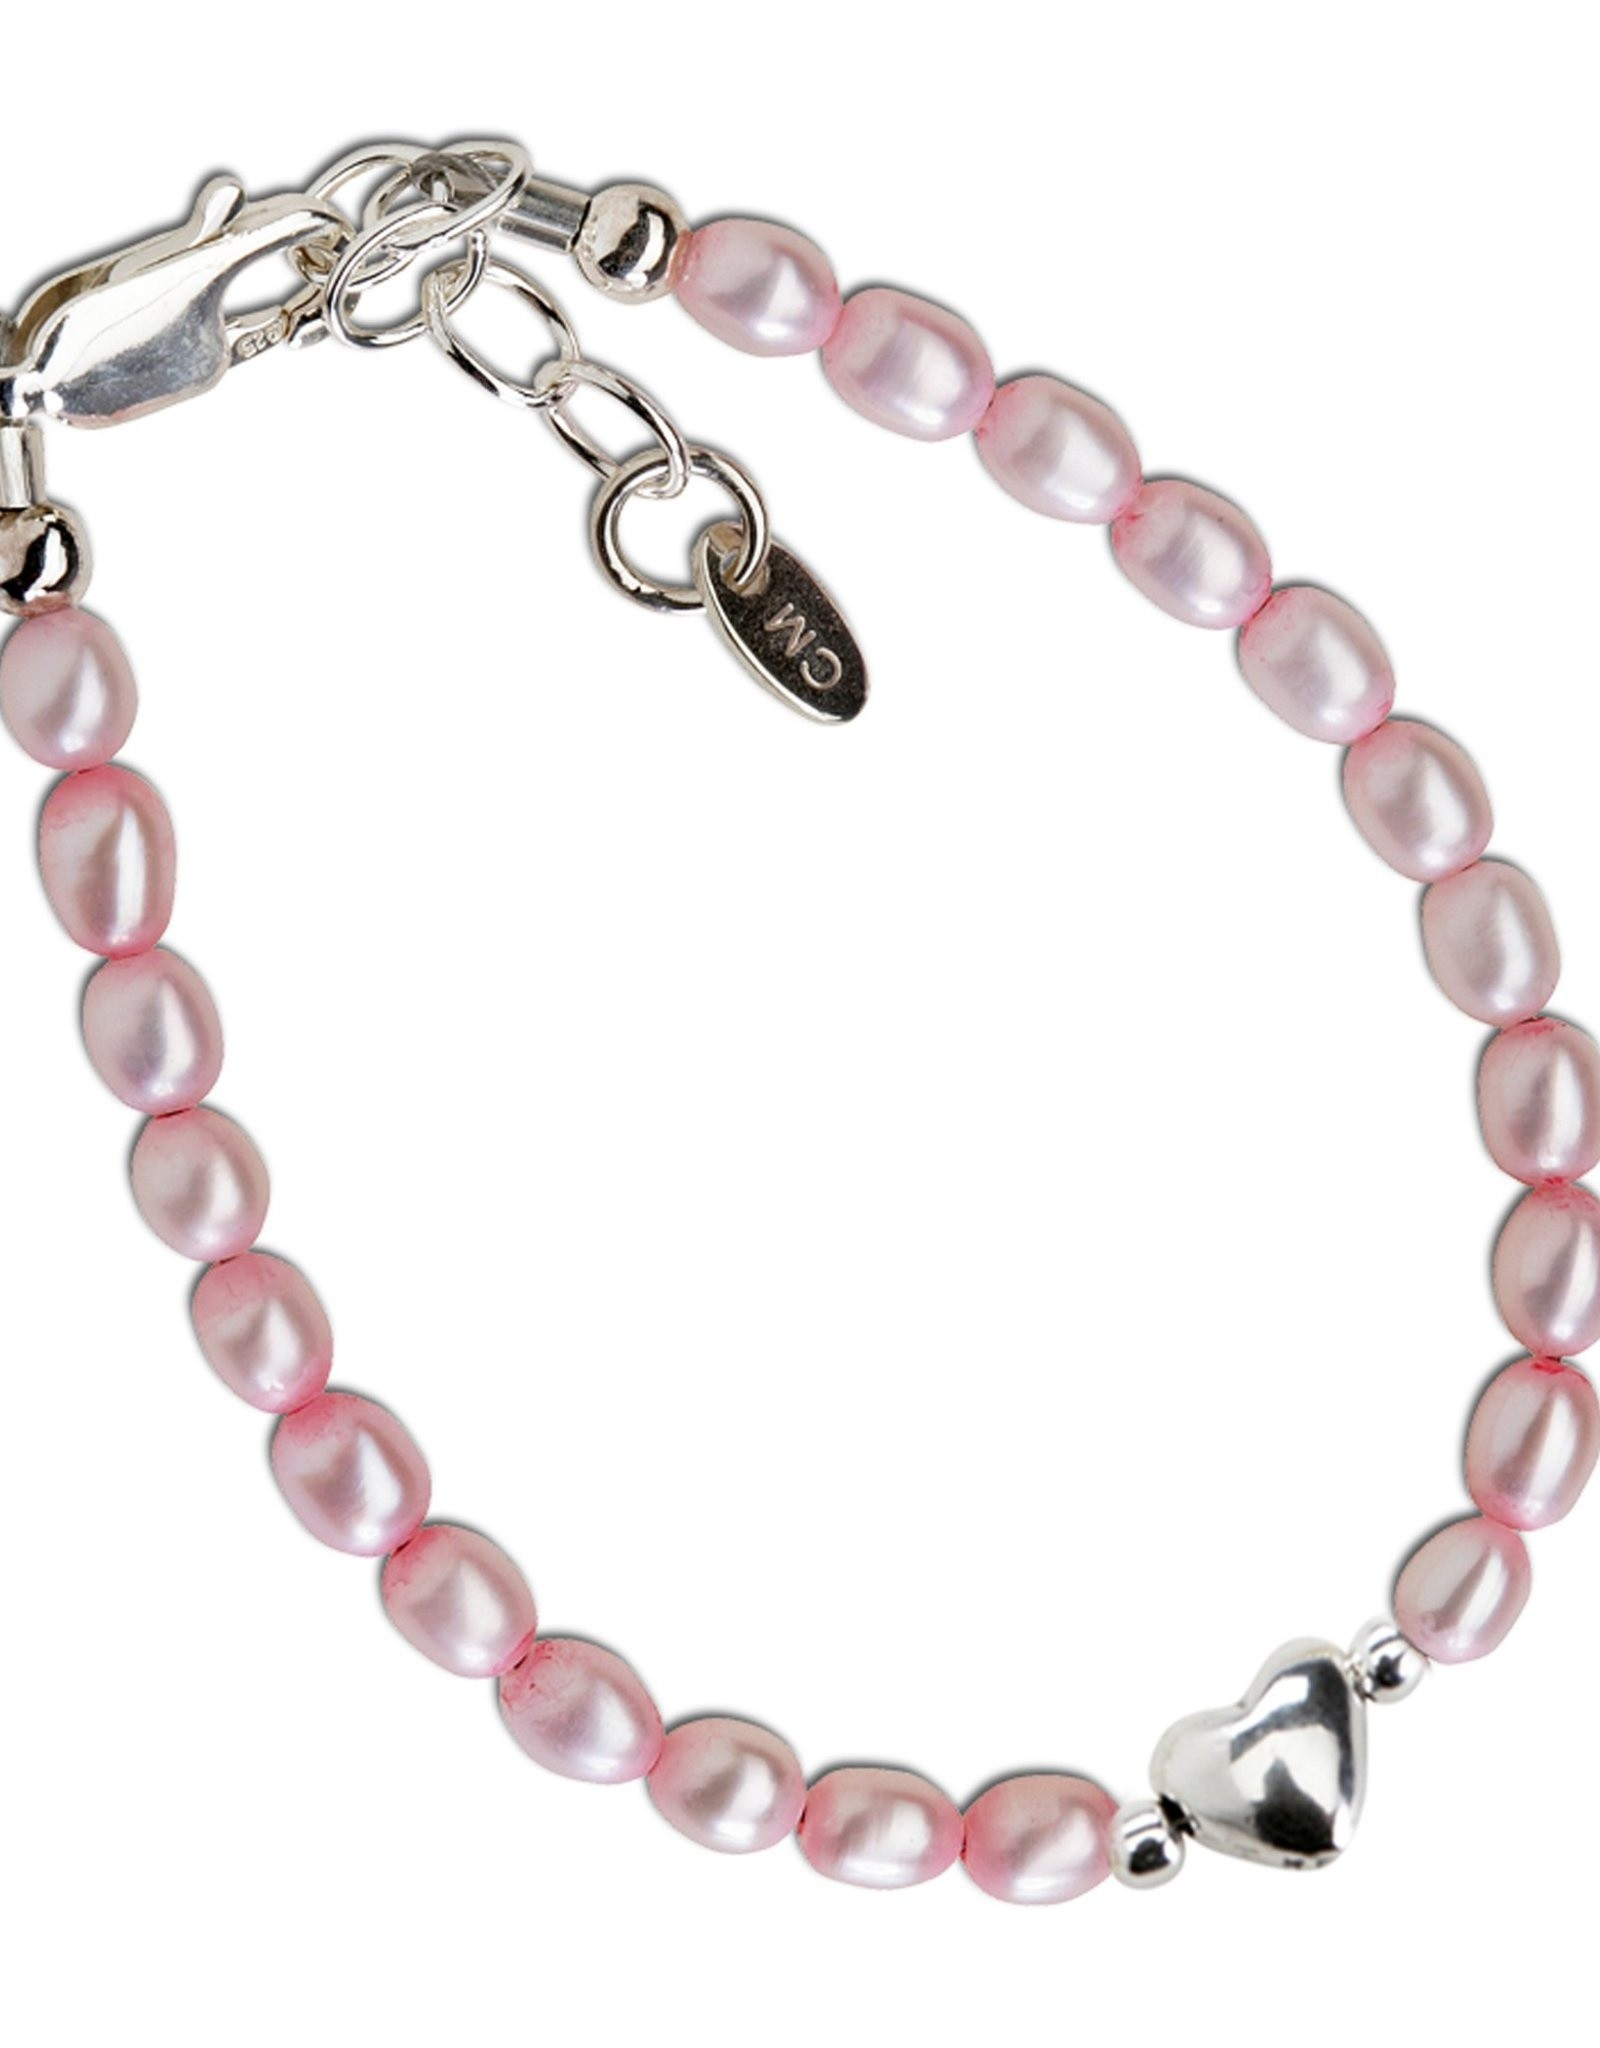 Cherished Moments Destiny Pink - Sterling Silver Pink Pearl Bracelet (SM) 0-12 Months